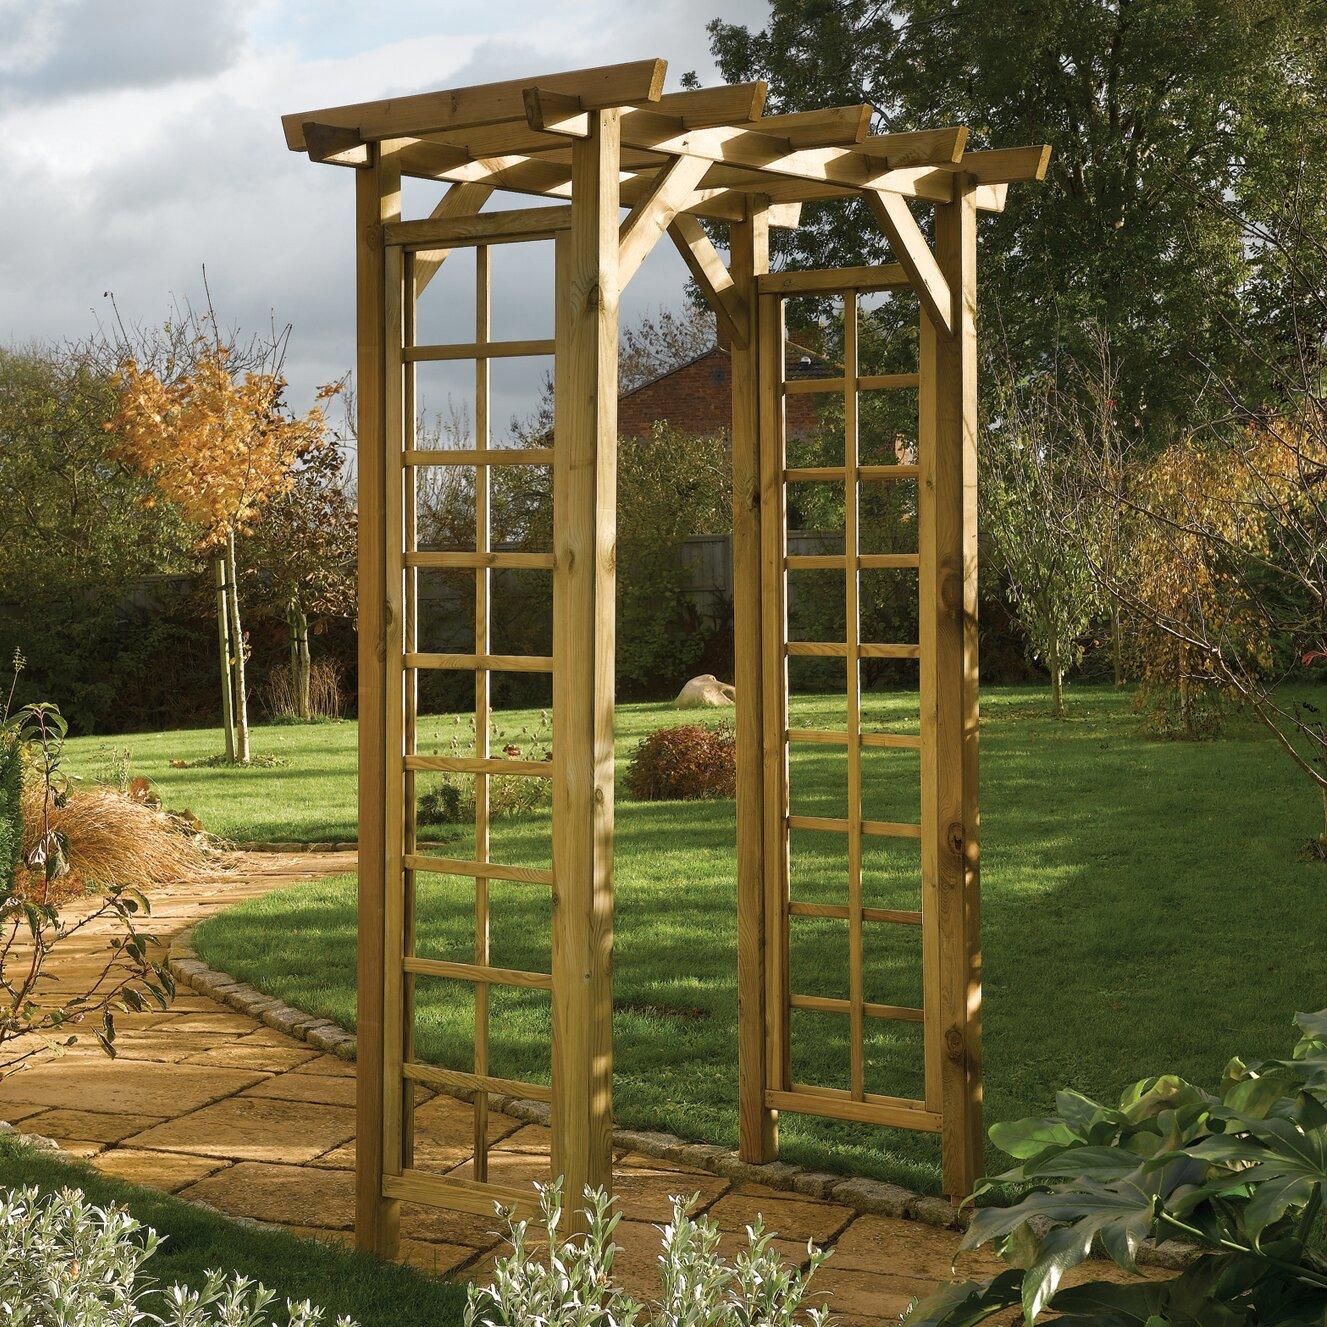 rowlinson rose arch reviews wayfair uk. Black Bedroom Furniture Sets. Home Design Ideas